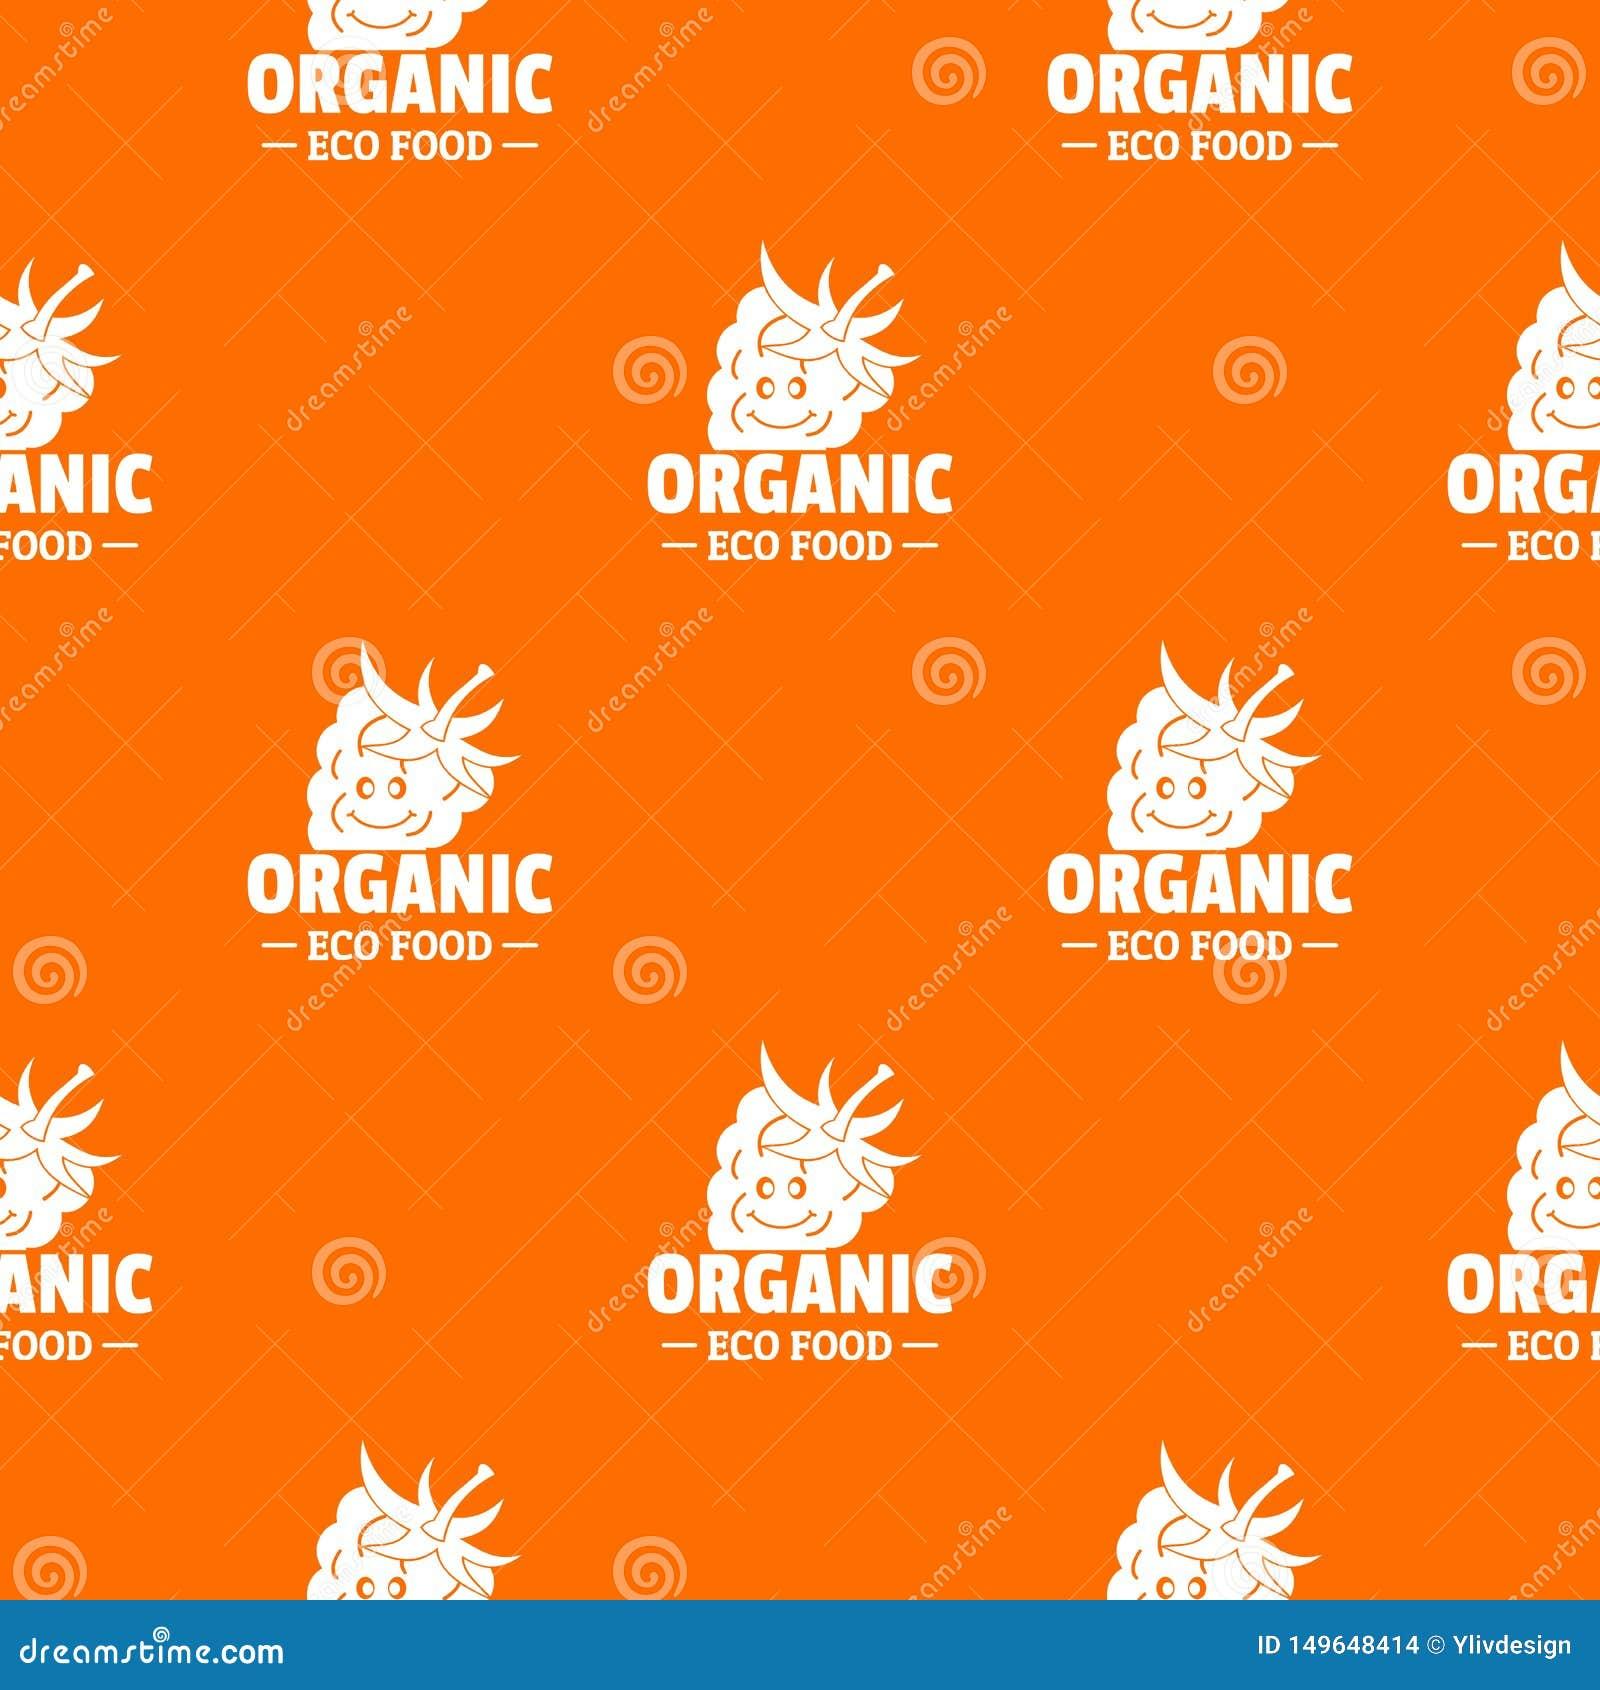 Organic Food Pattern Vector Orange Stock Vector Illustration Of Pattern Shape 149648414